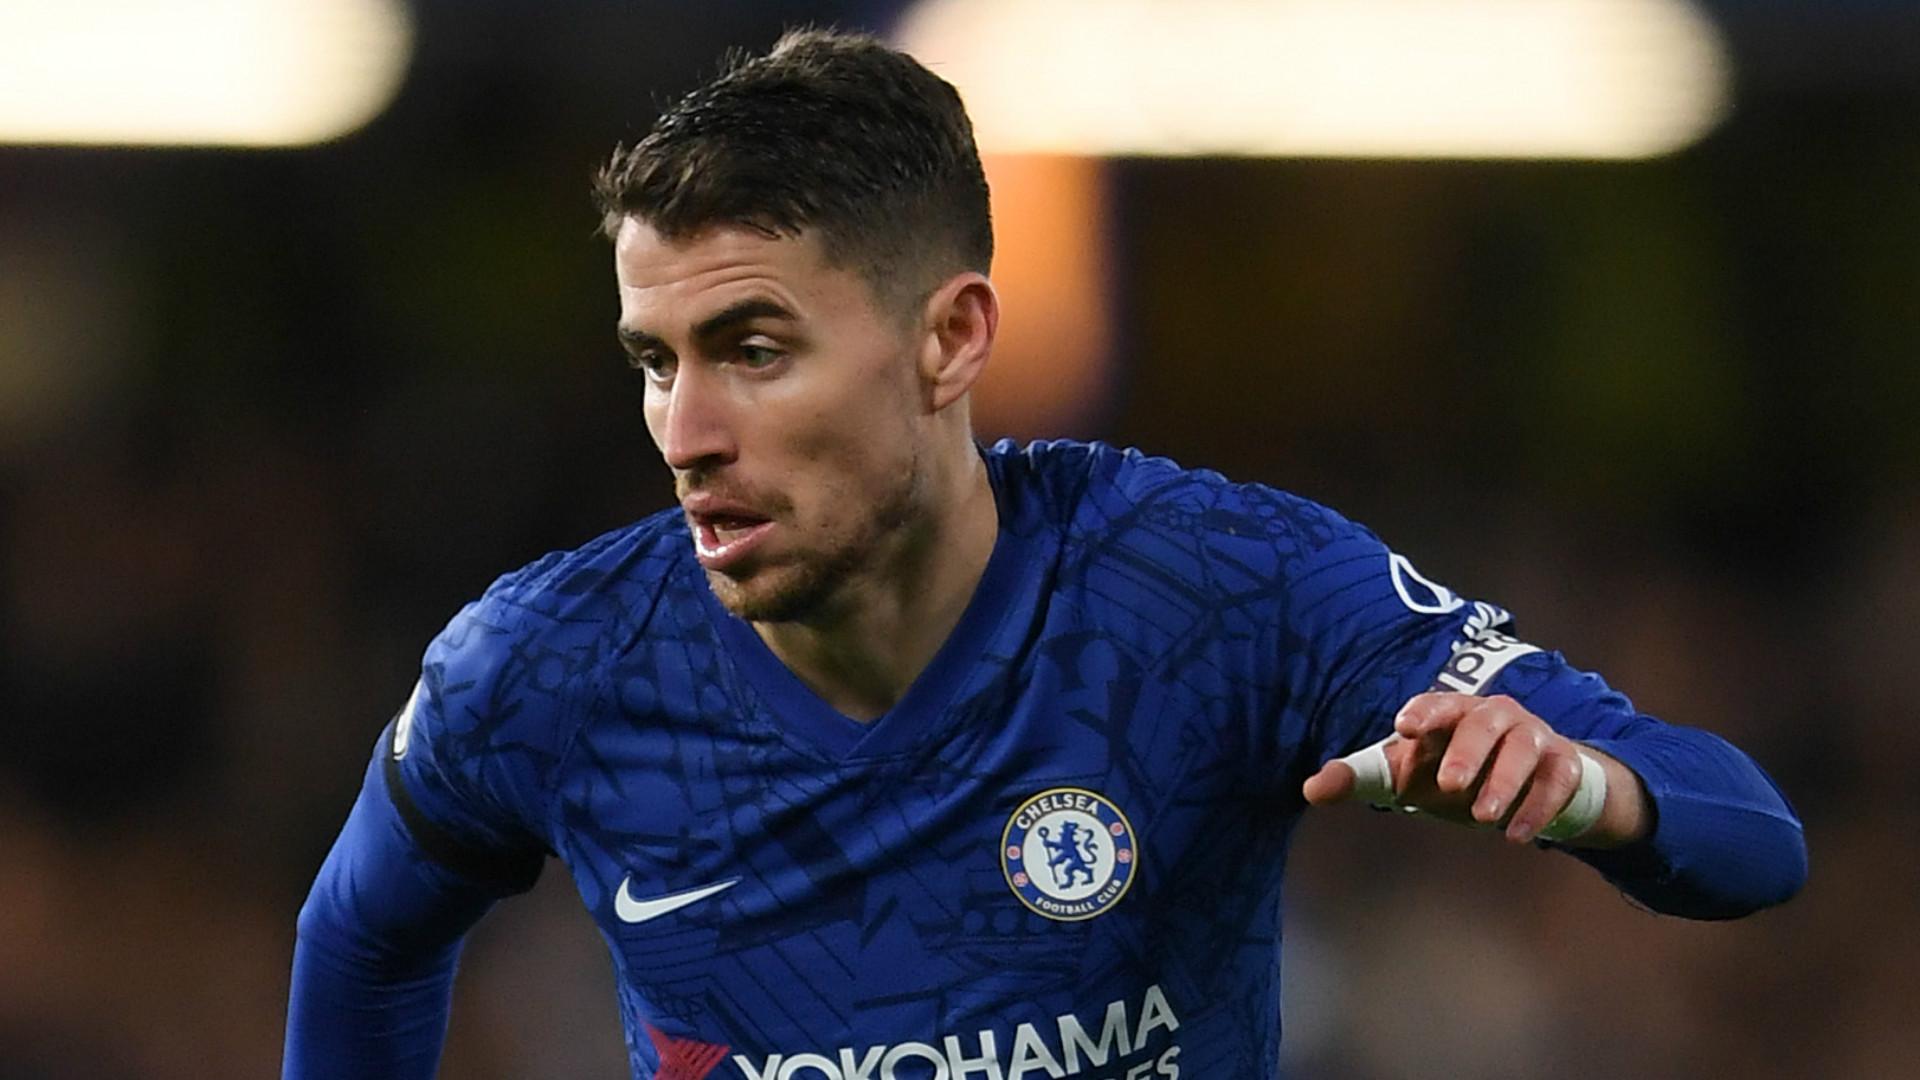 'It feels like we lost' - Chelsea midfielder Jorginho distraught after drawing 10-man Arsenal